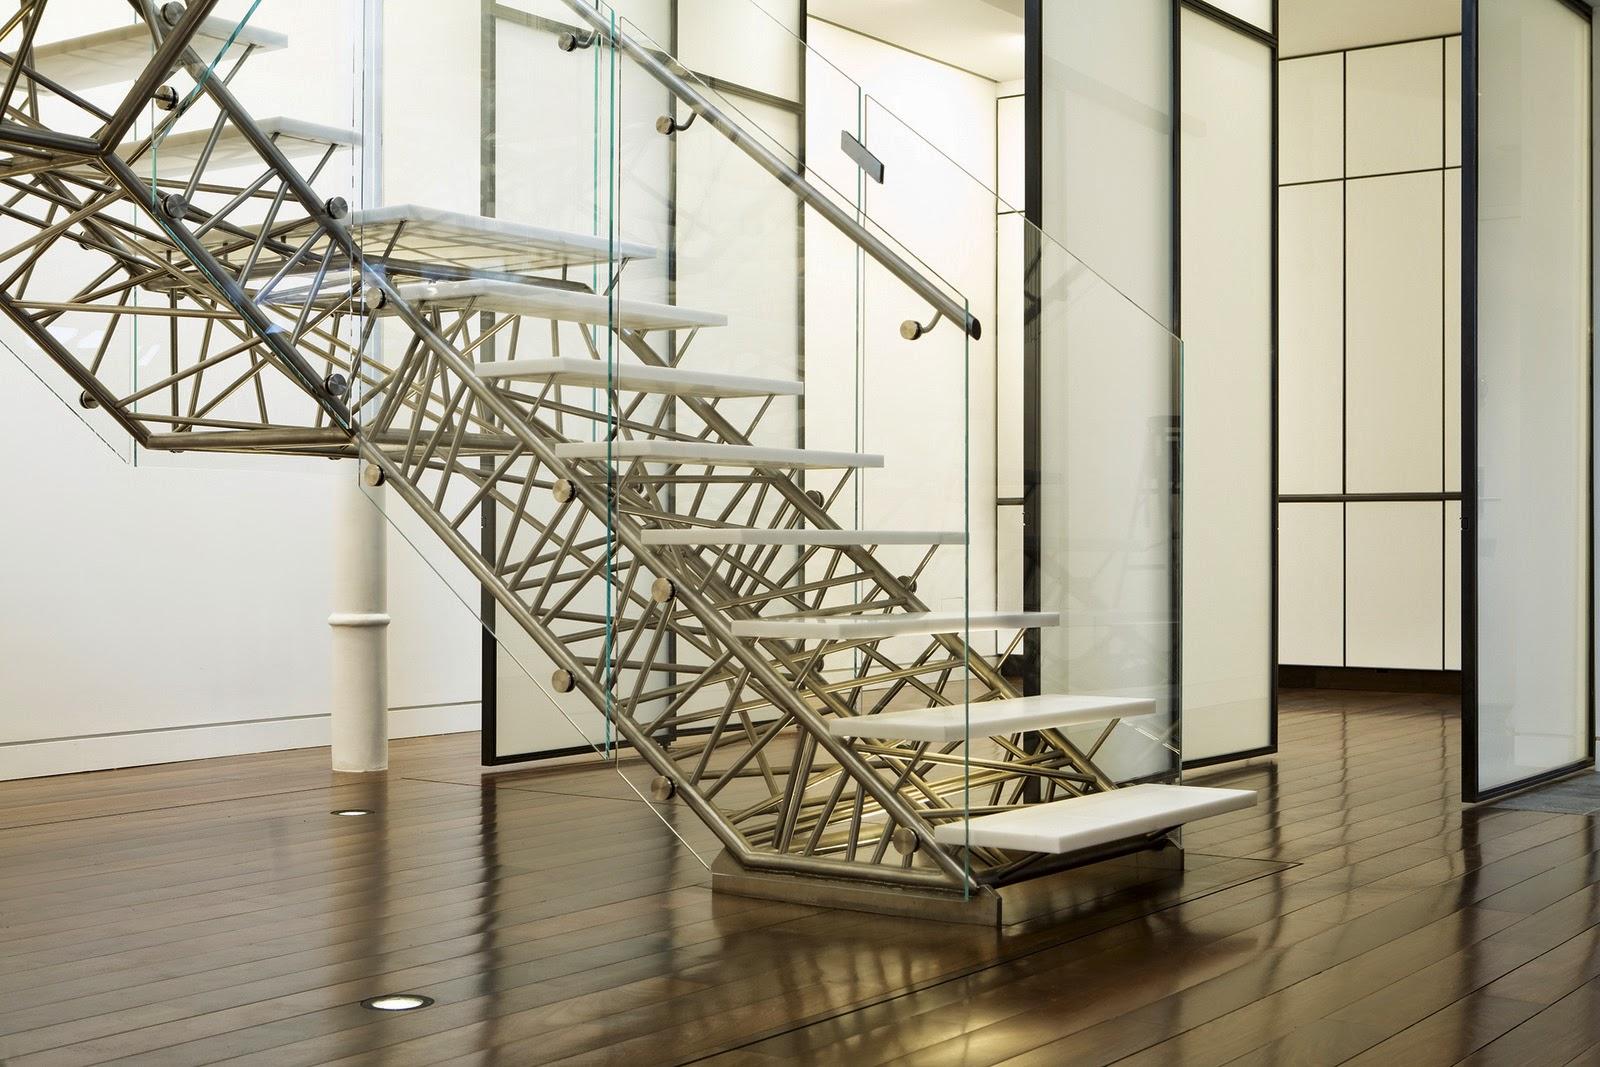 Contoh model tangga dari besi